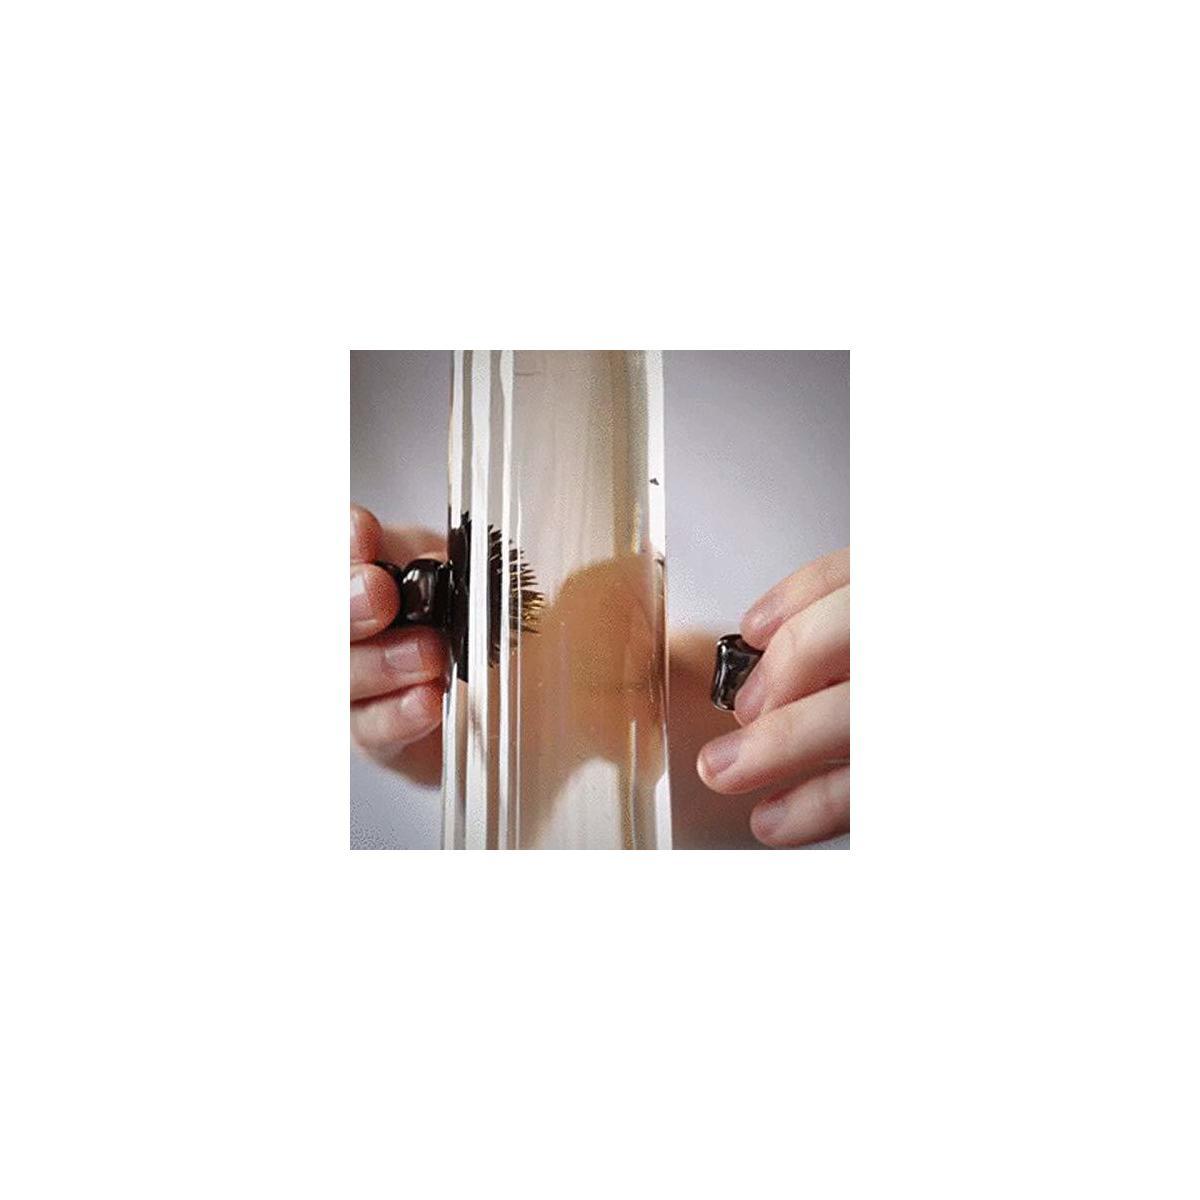 Cool Lava Lamp - Inspired Designs Magnetic Ferrofluid  'The Inspiration', 450 mL